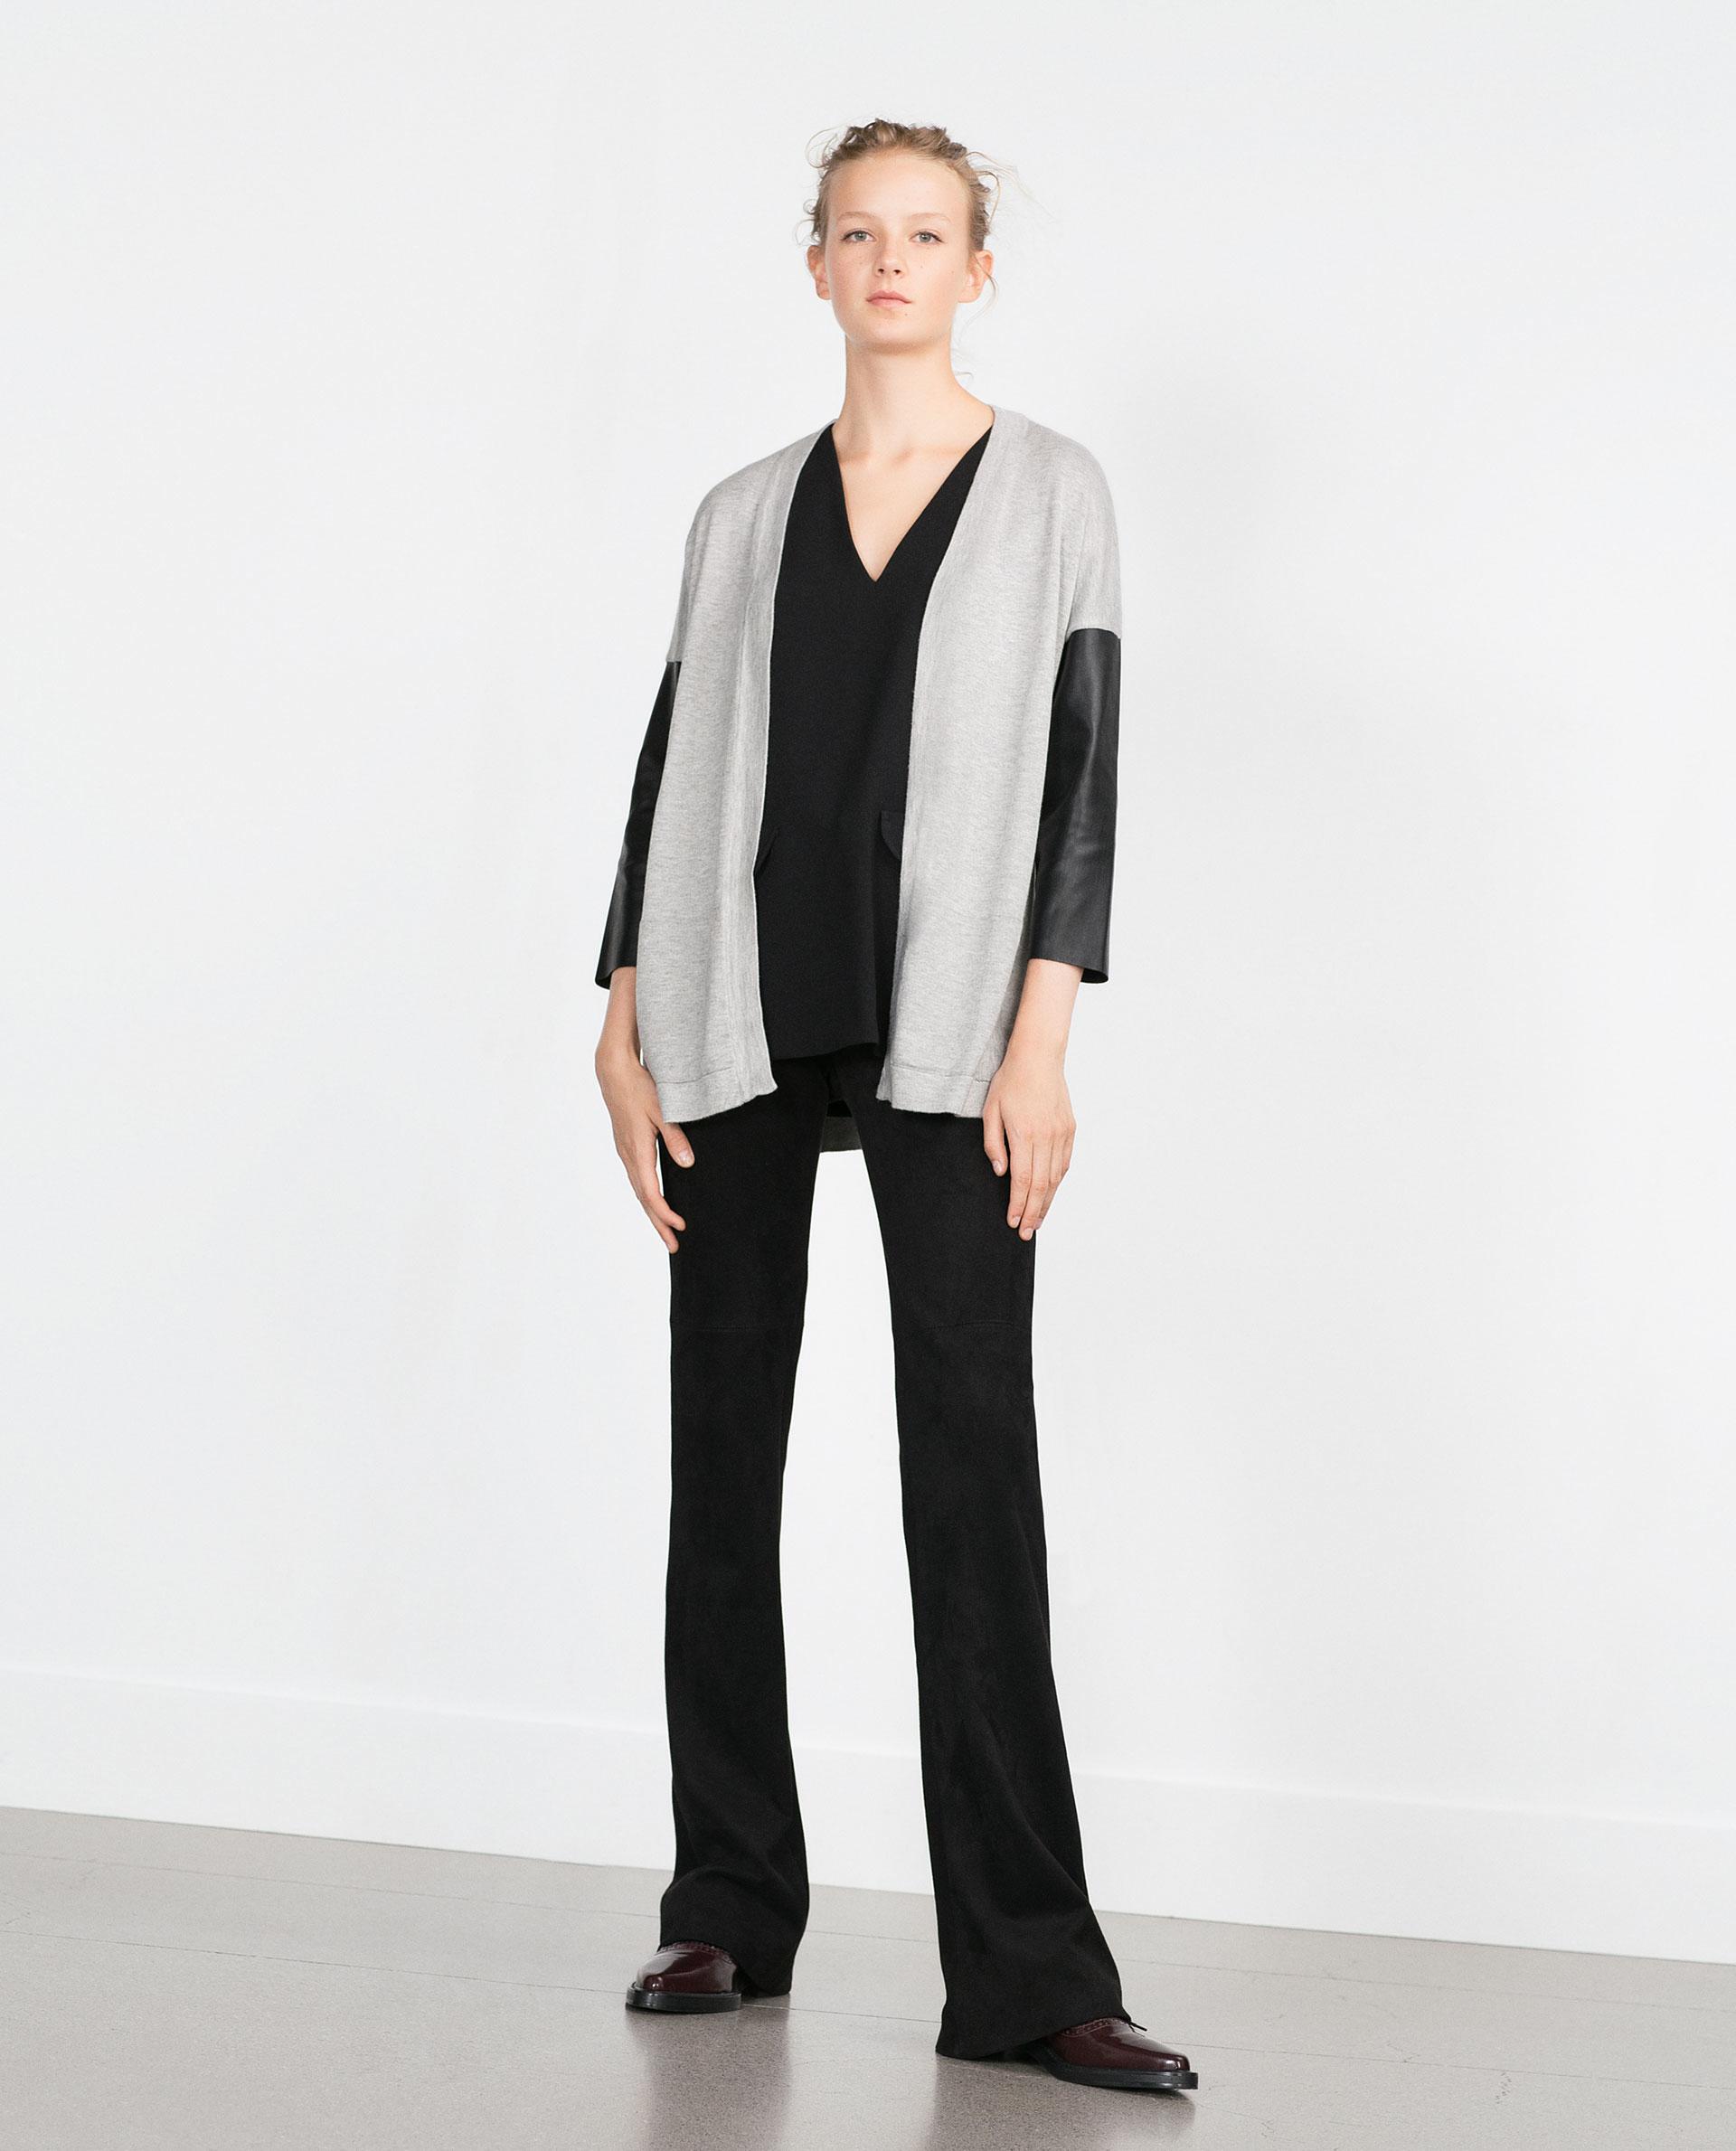 Zara jacket with leather sleeves